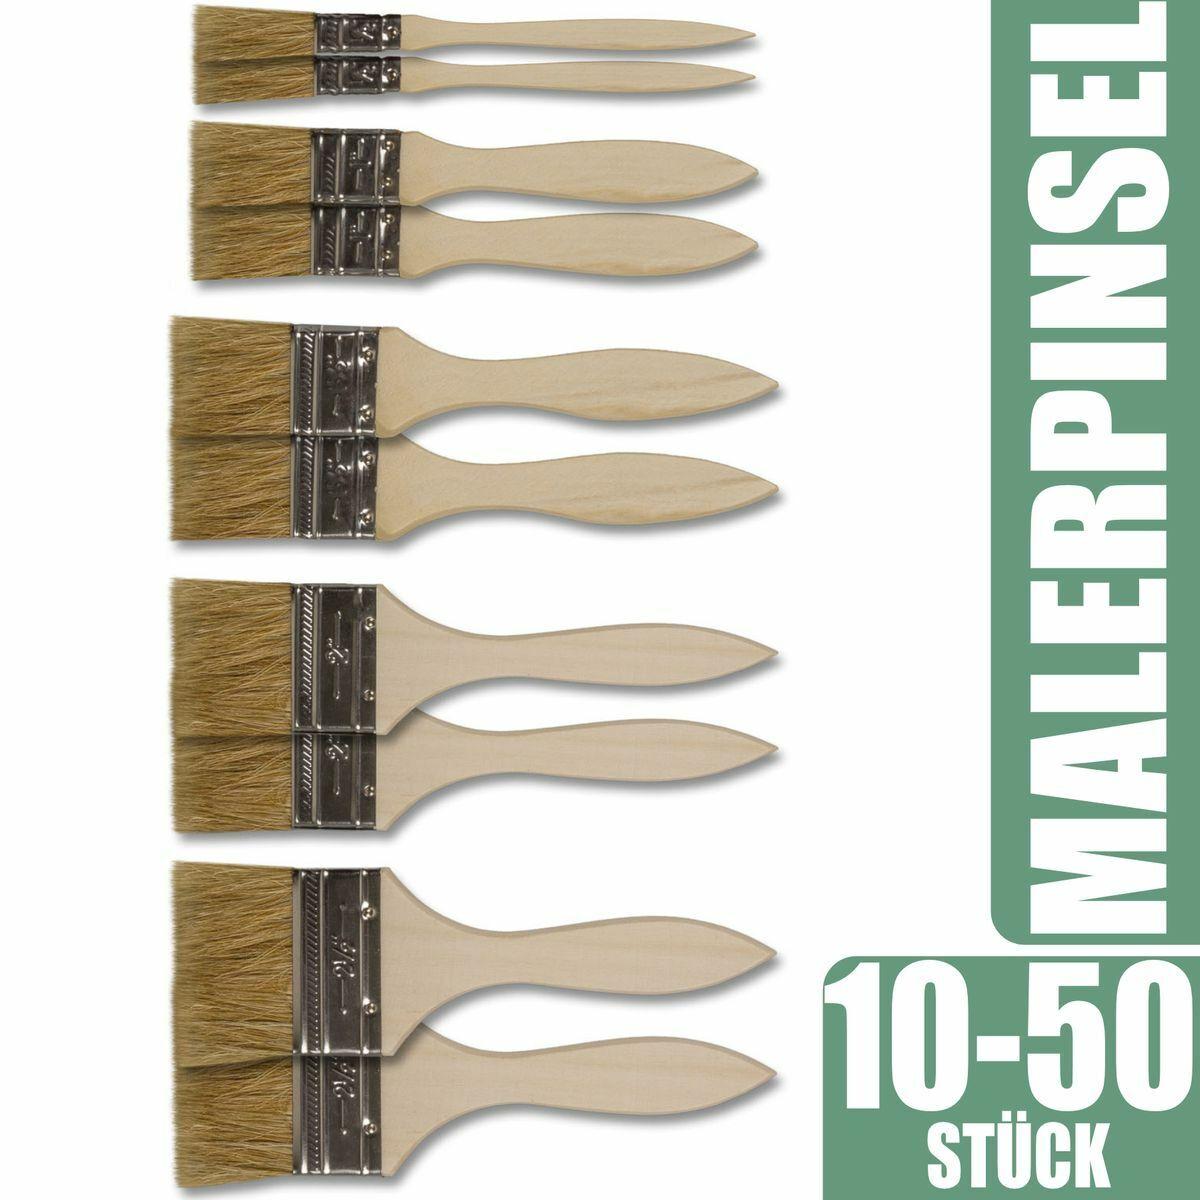 60 x Ringpinsel Lackpinsel Lackierpinsel Rundpinsel Lasurpinsel Industriepinsel